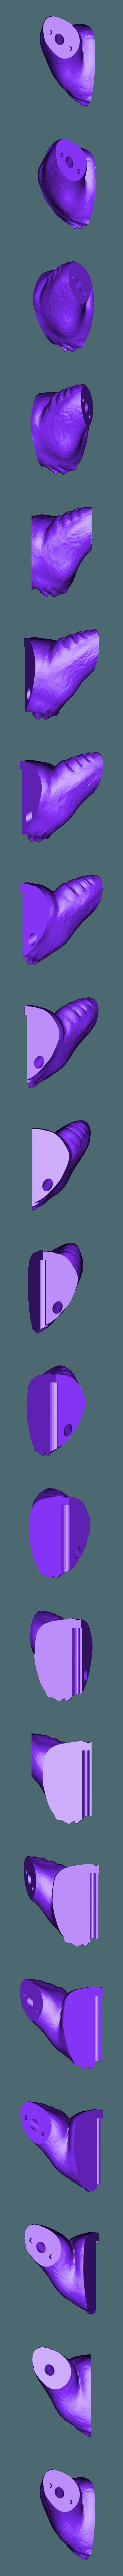 GADGETS legs pt1.stl Download free STL file GADGET the robotic Gremlin • 3D printing object, atarka3